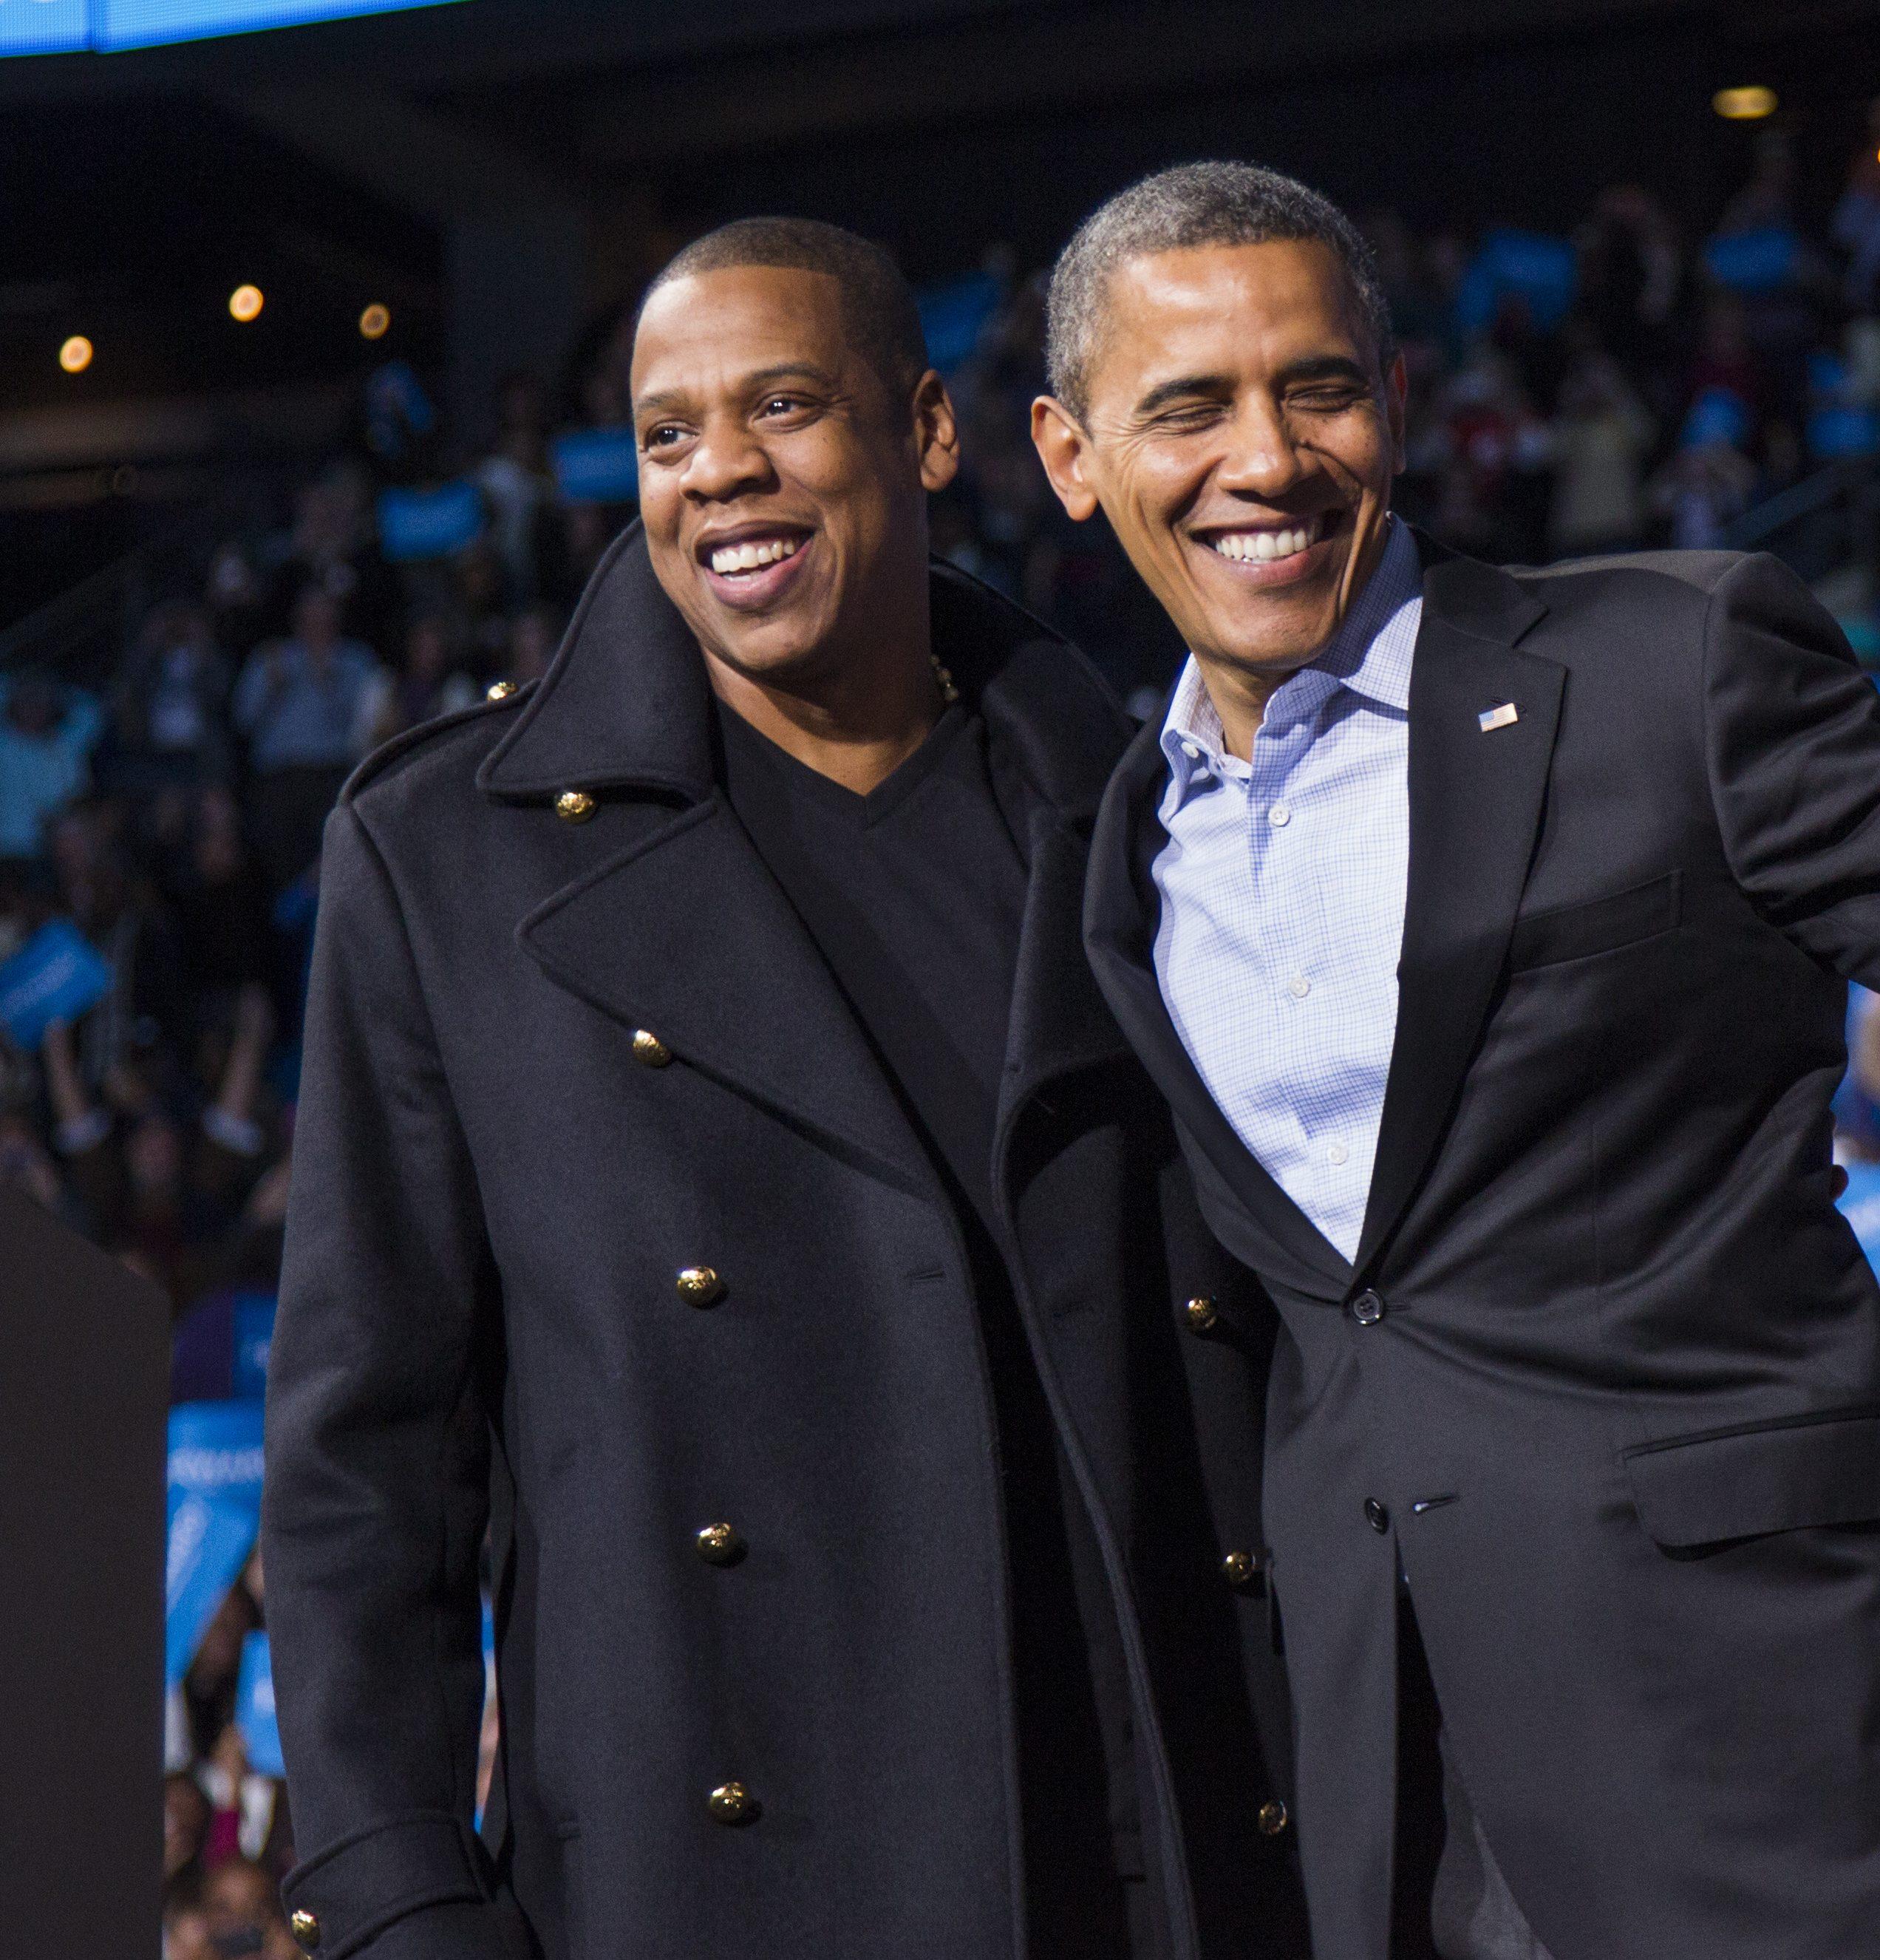 USA - Presidential Election 2012 - President Barack Obama